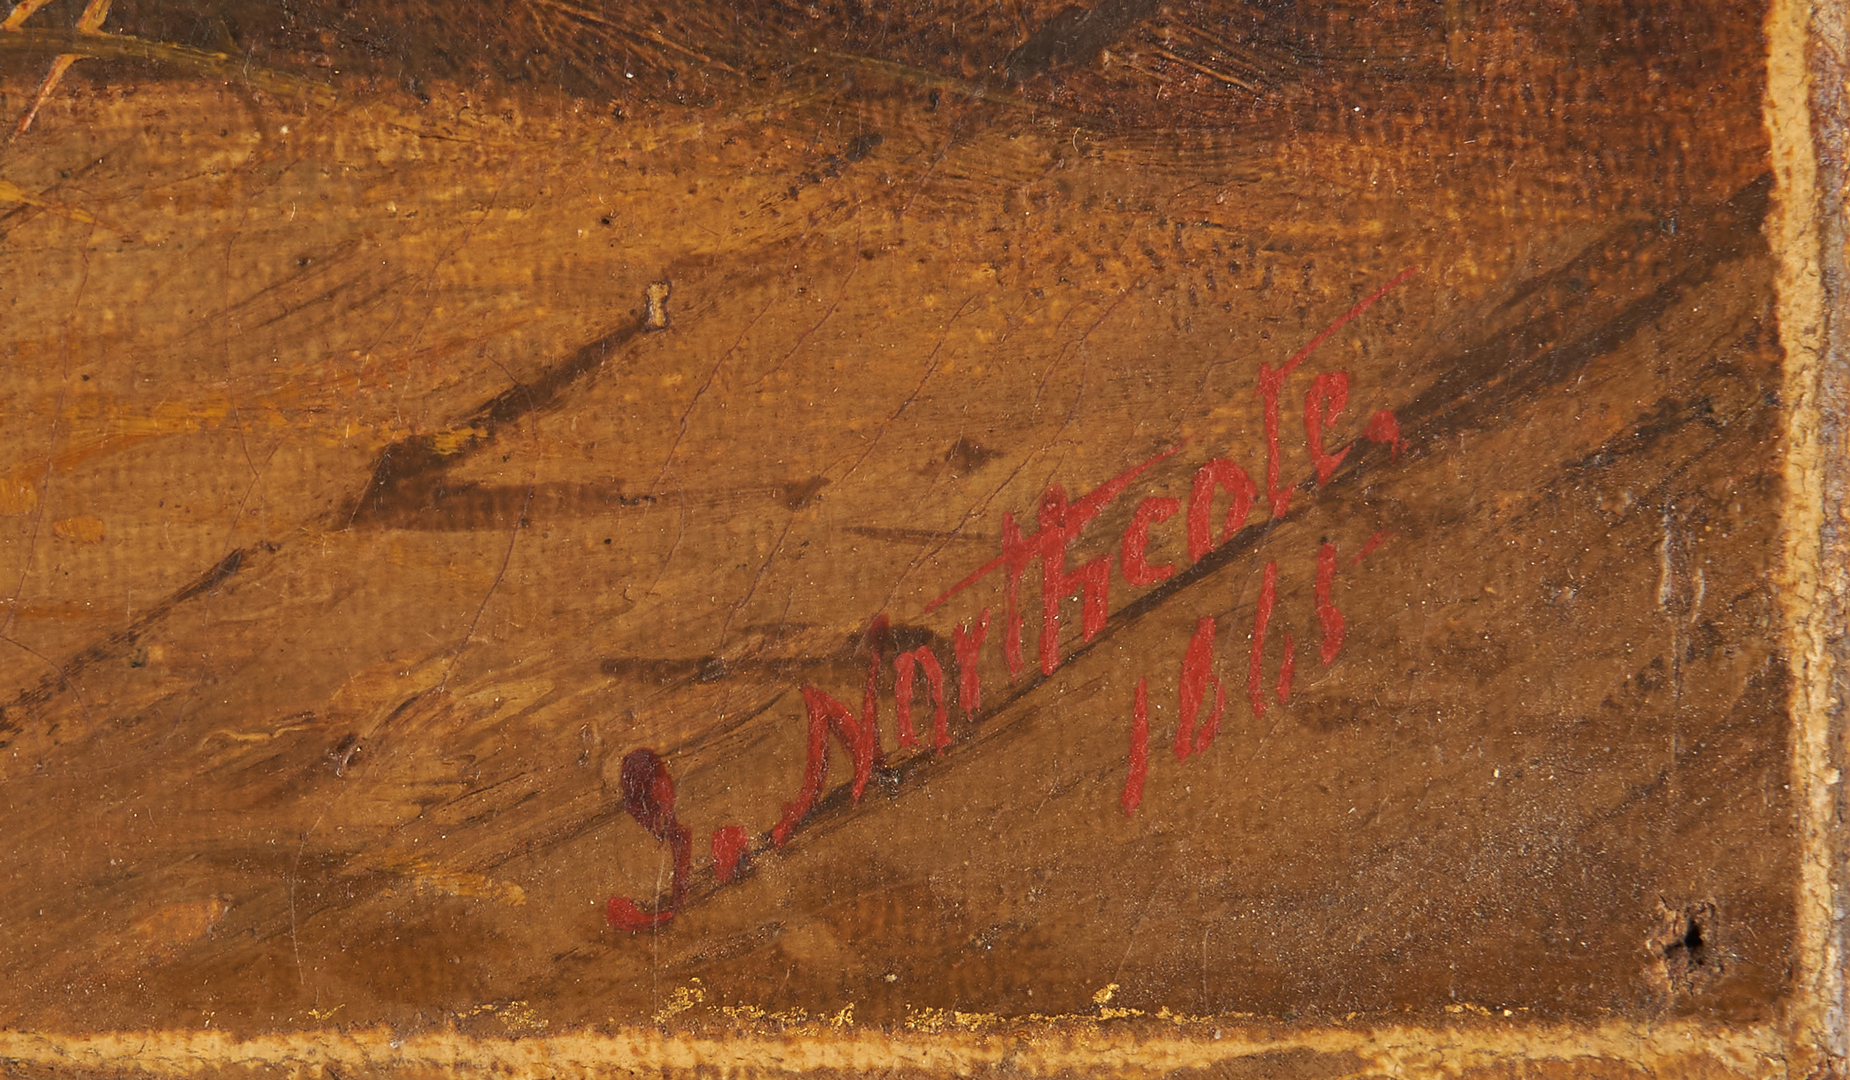 Lot 352: James Northcote O/C painting of dogs